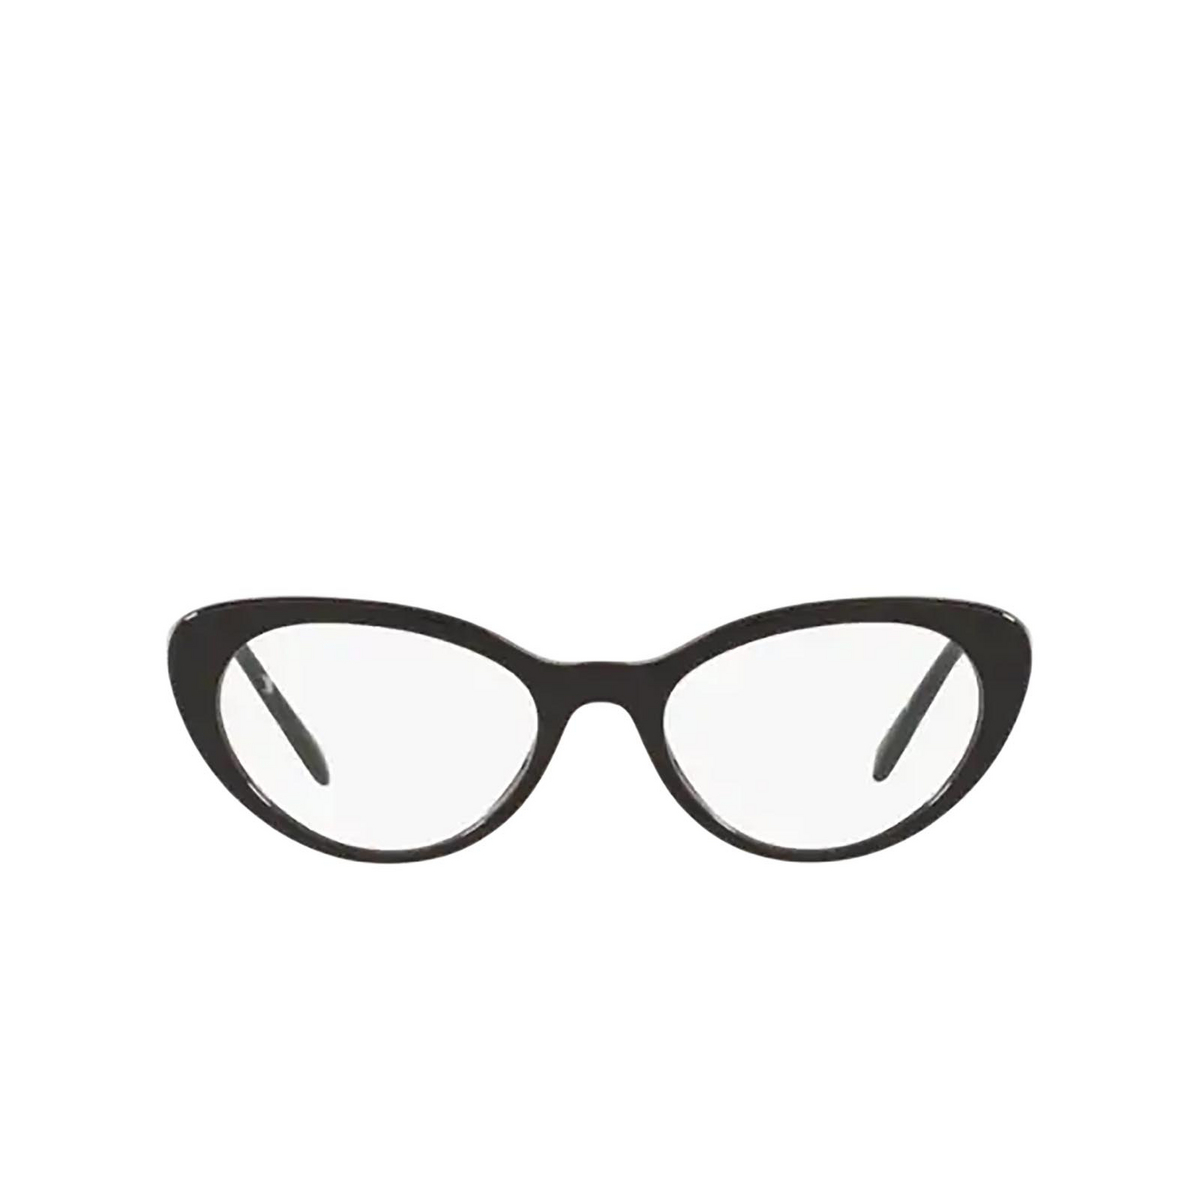 Miu Miu® Cat-eye Eyeglasses: MU 05RV color Black 1AB1O1 - front view.